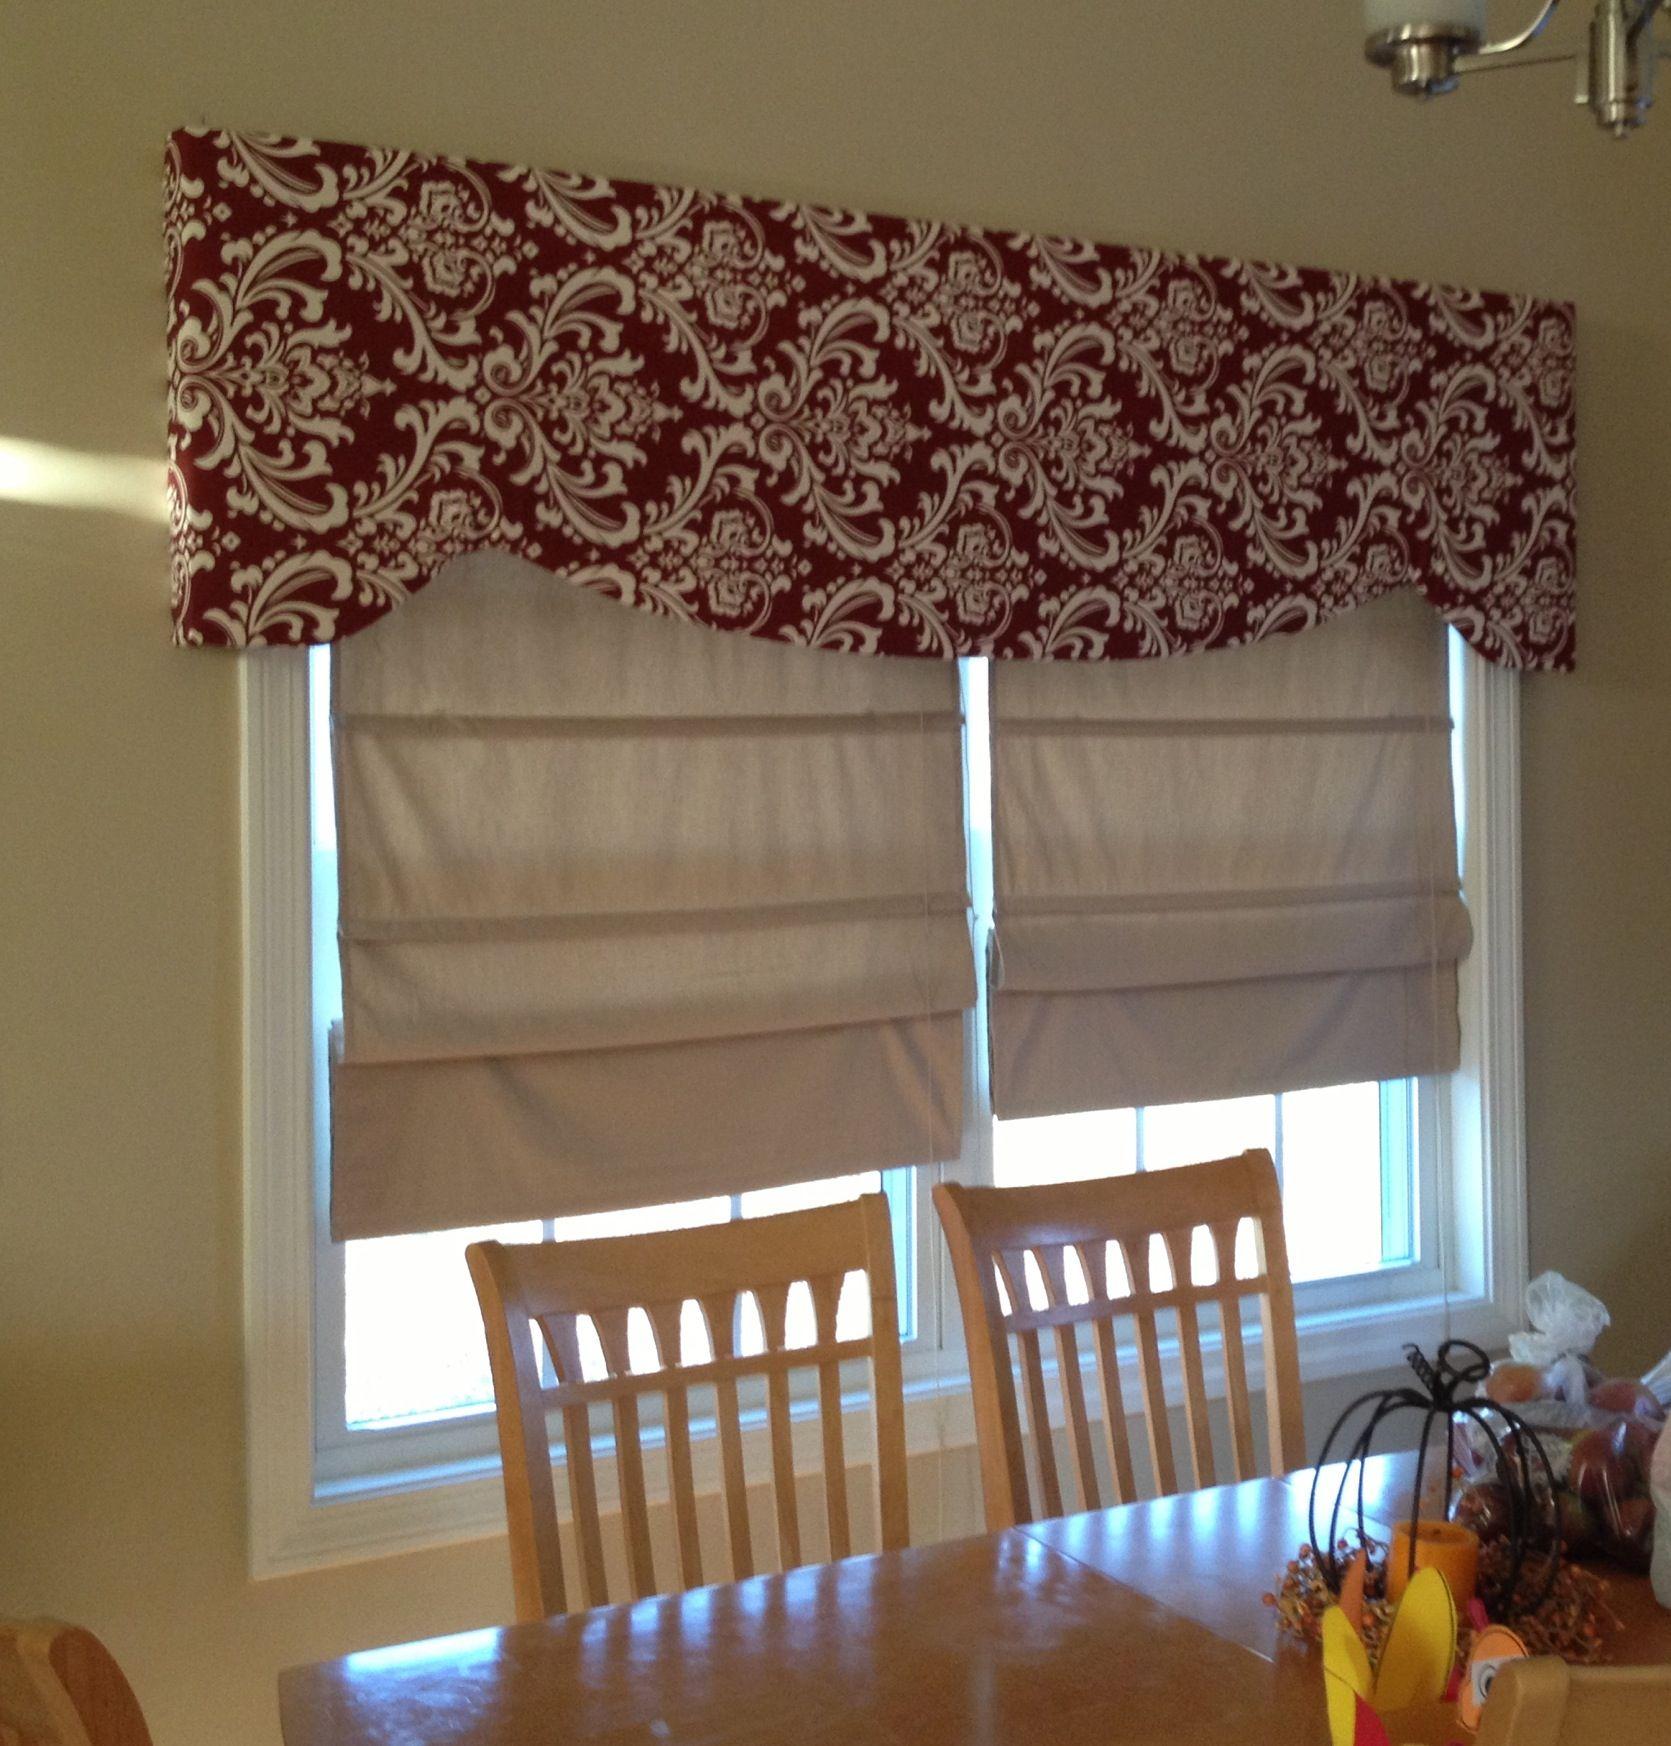 Eyebrow window coverings  upholstered window cornice  for the home  pinterest  window